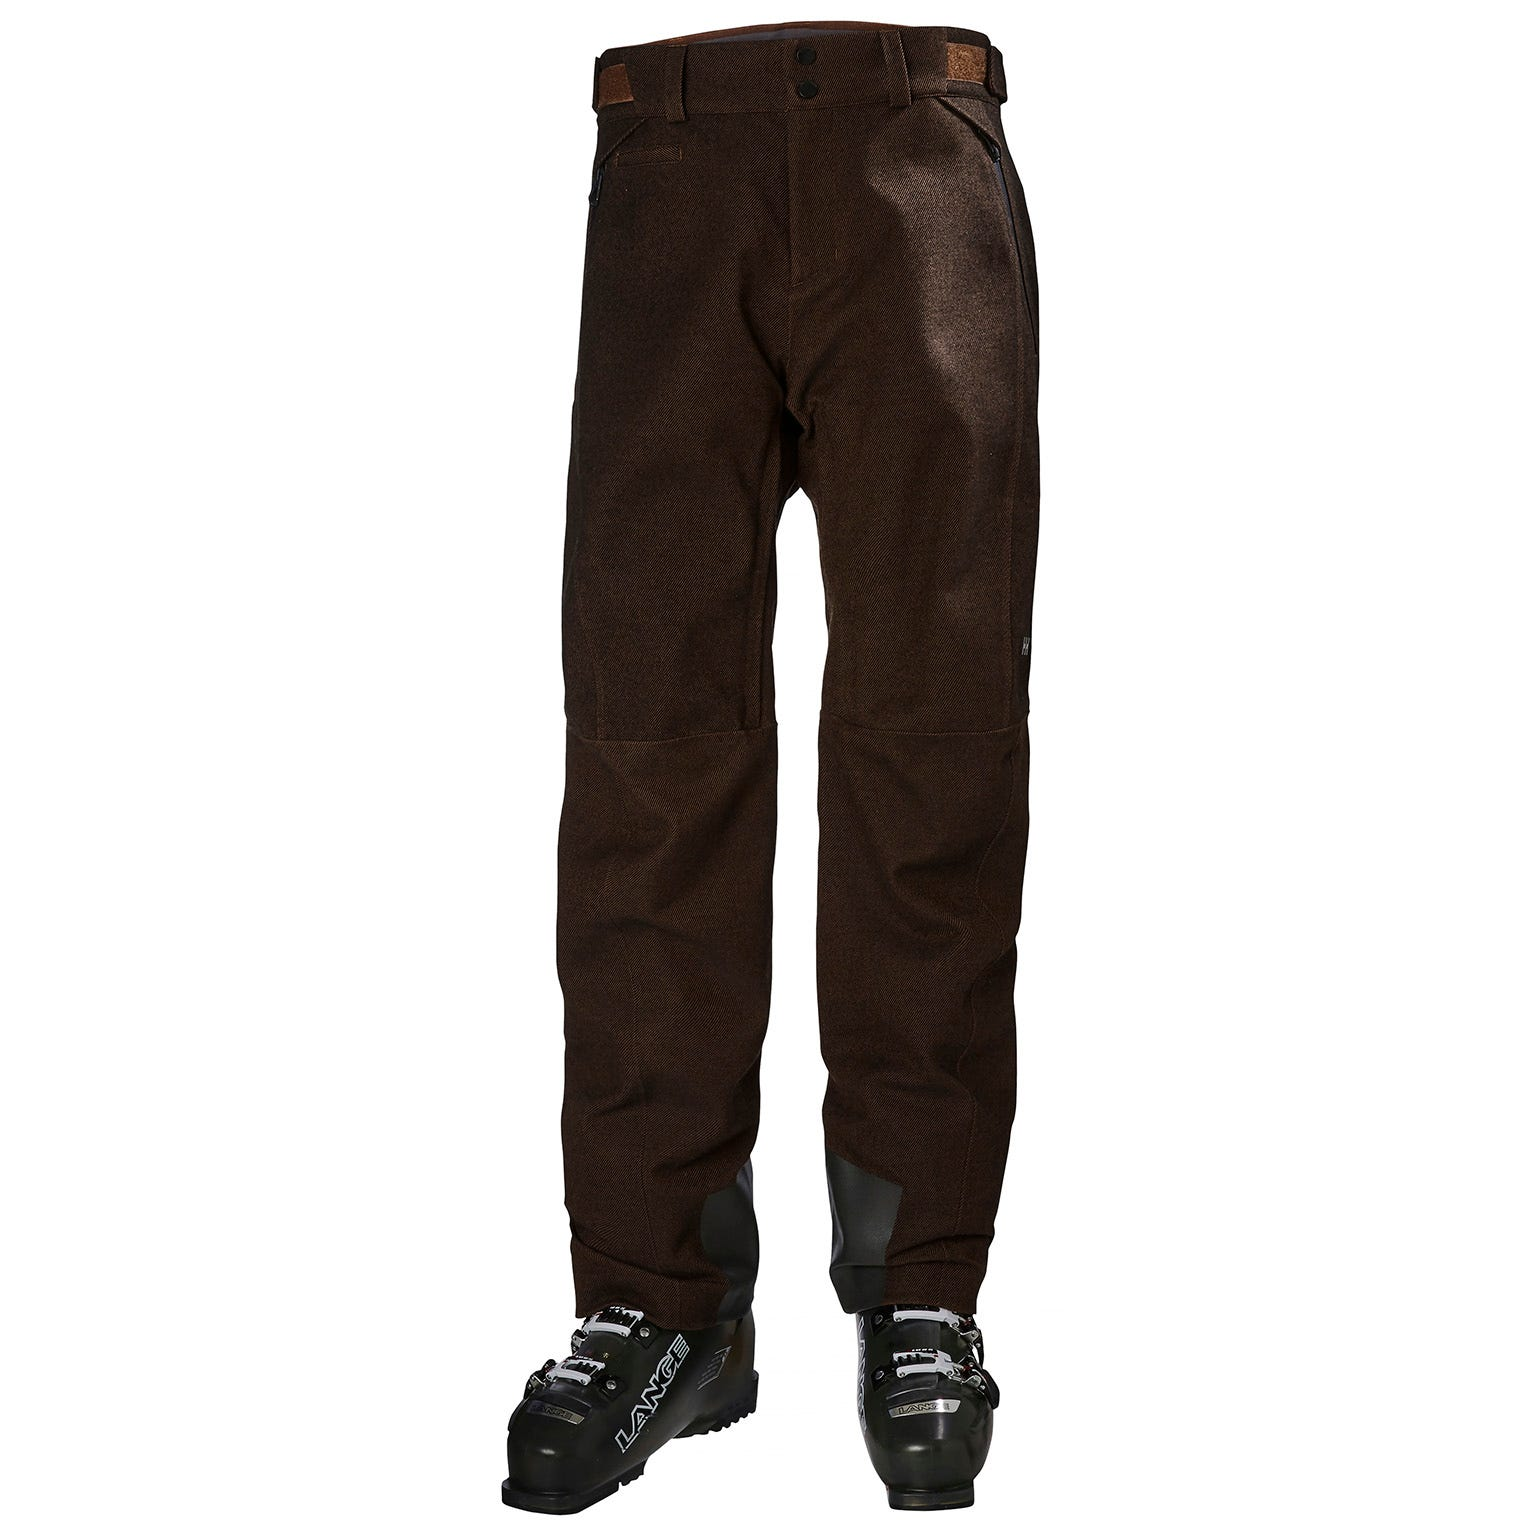 Helly Hansen Mens Jackson Insulated Ski Trouser Brown M